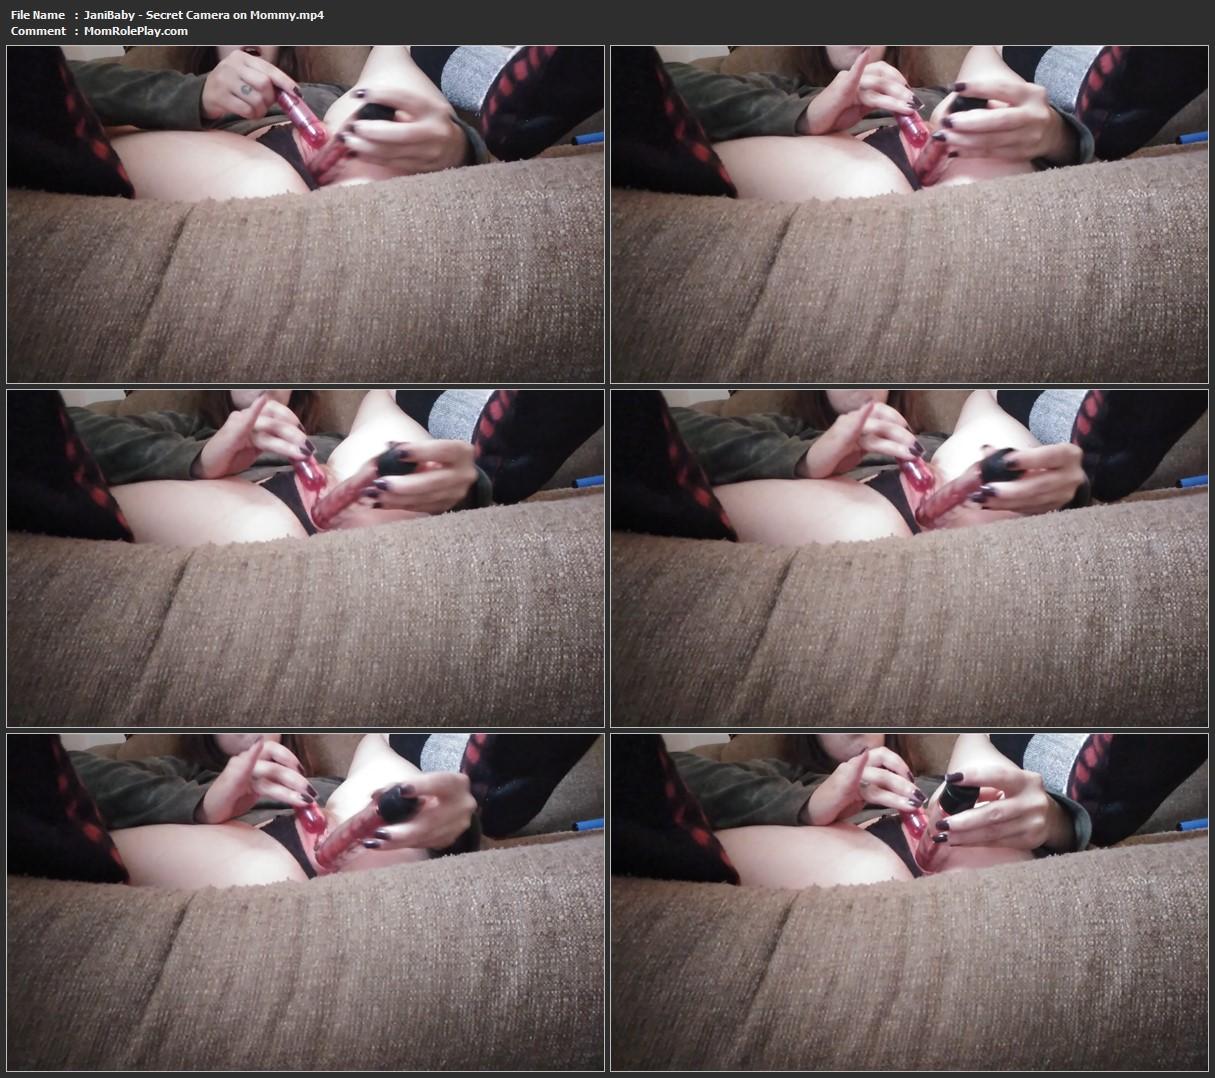 Jani Baby - Secret Camera on Mommy